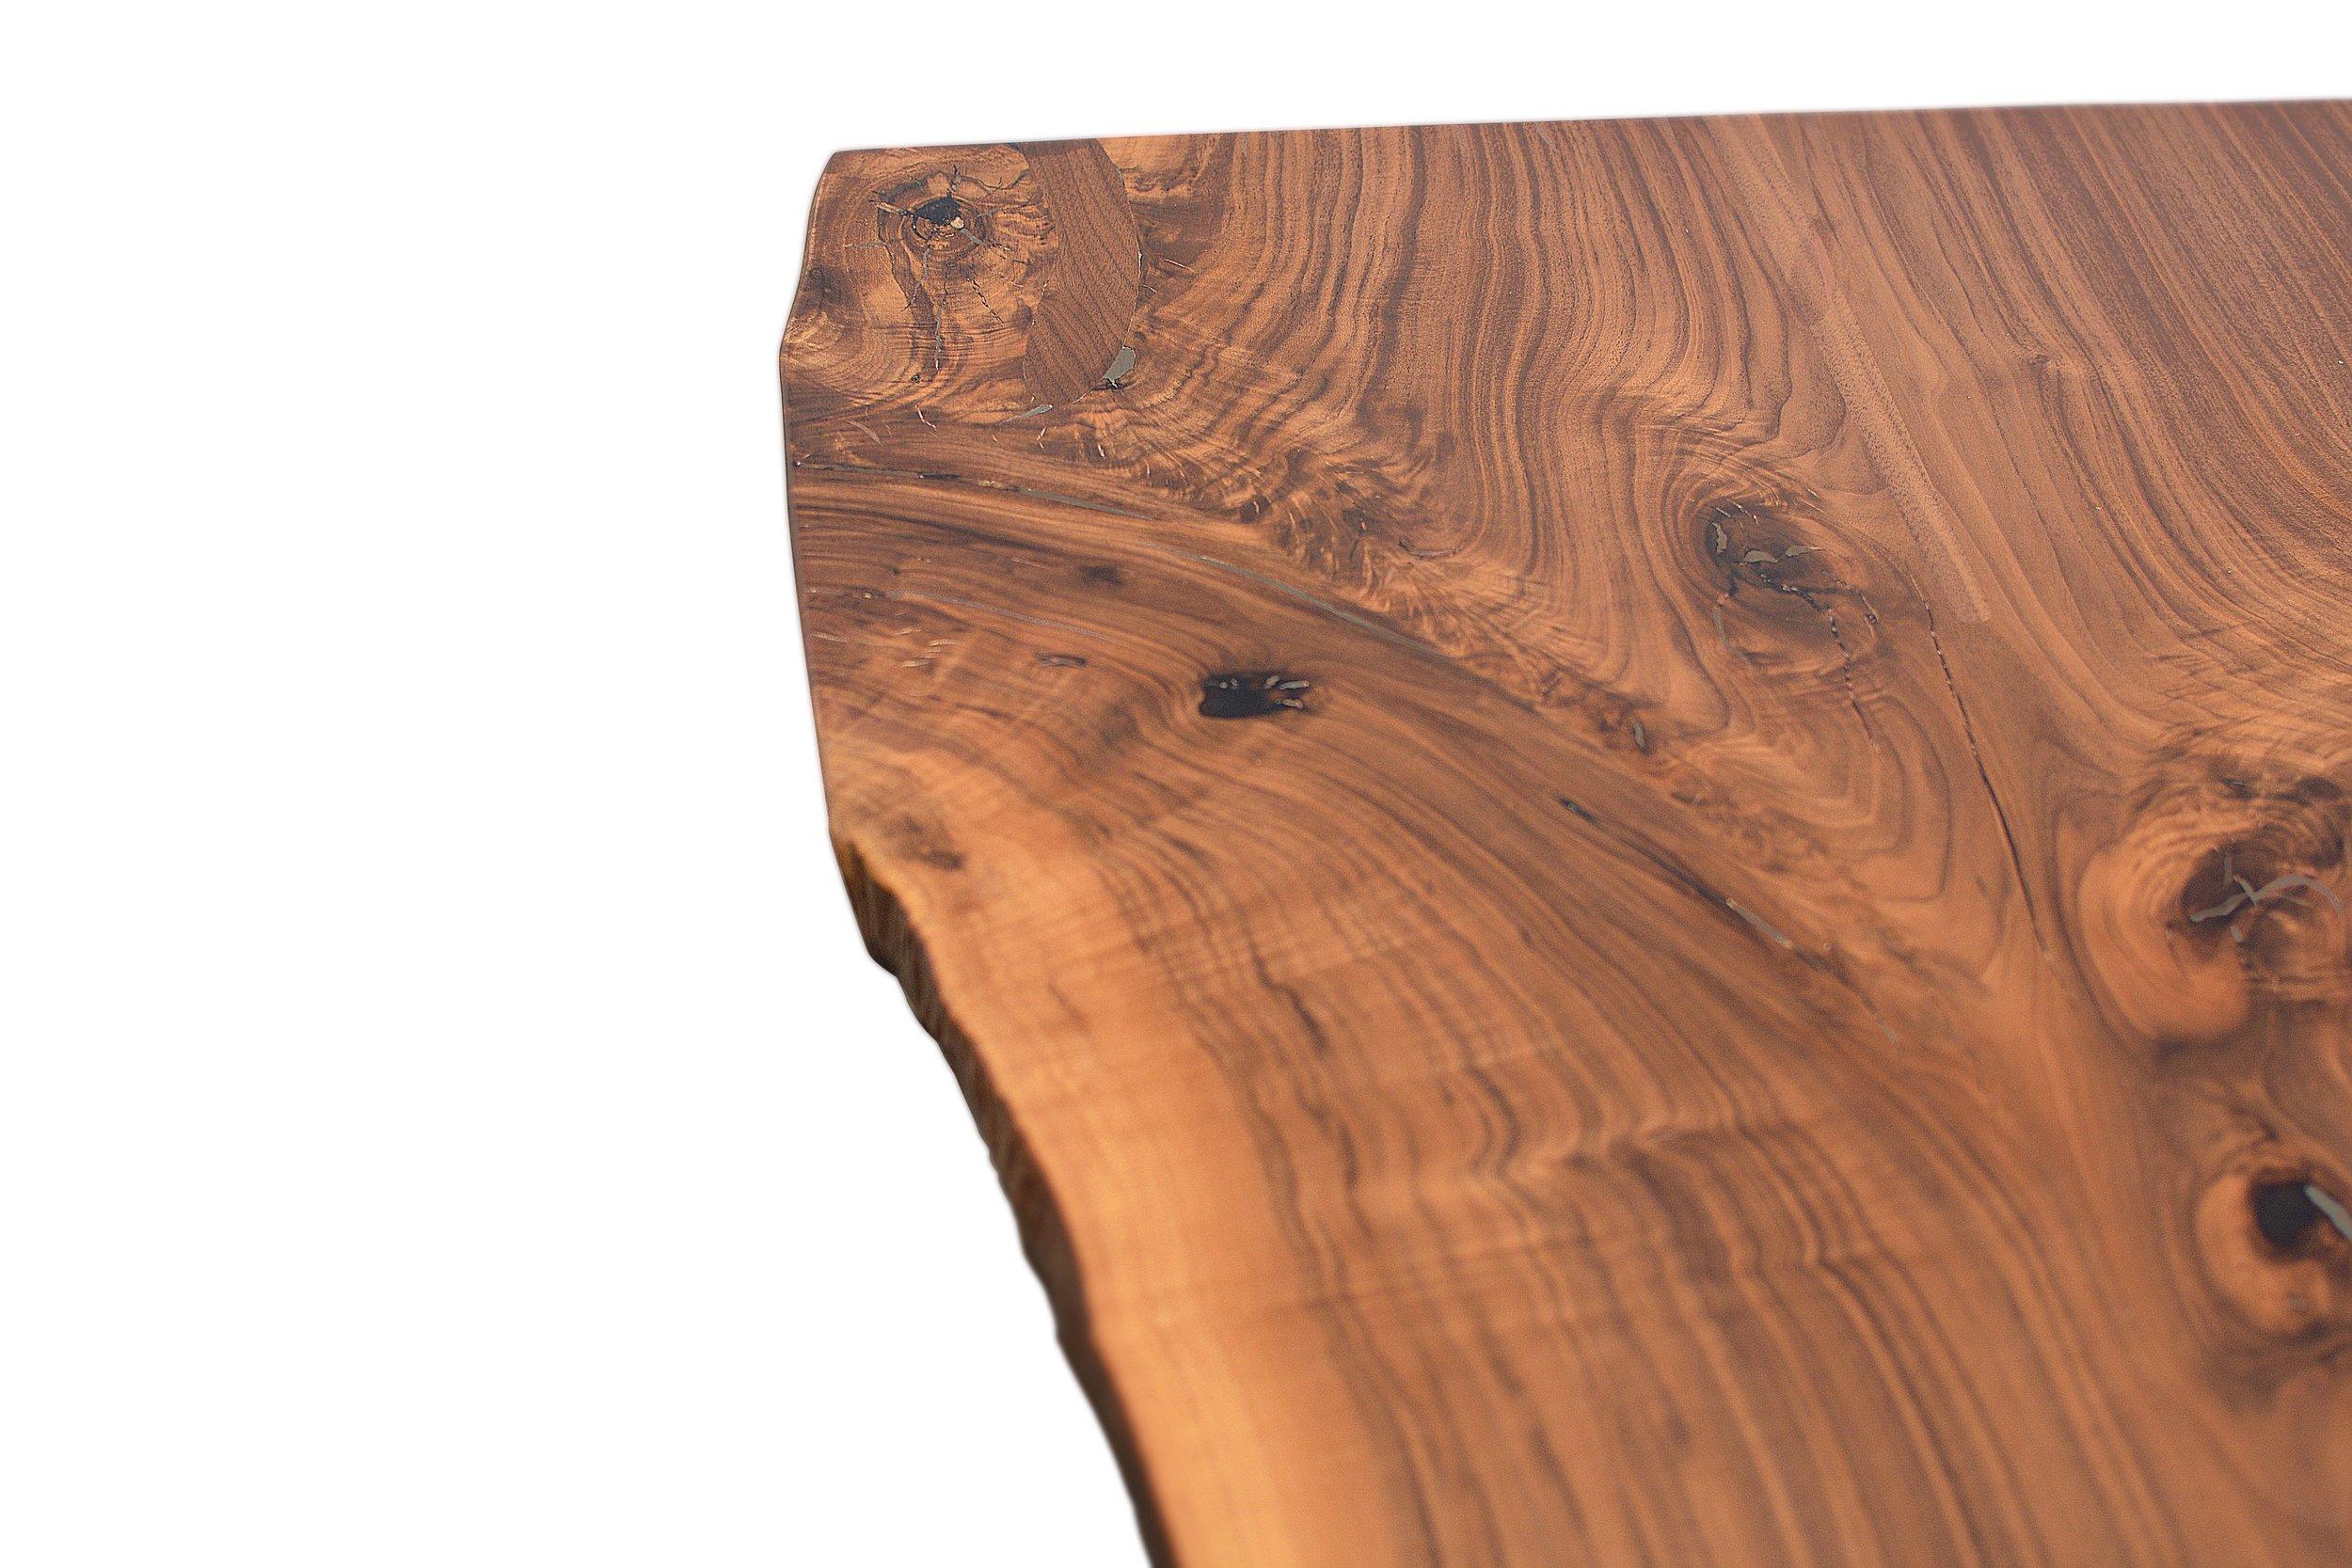 Etz & Steel Hermes Live Edge Walnut Table Close Up 8.JPG